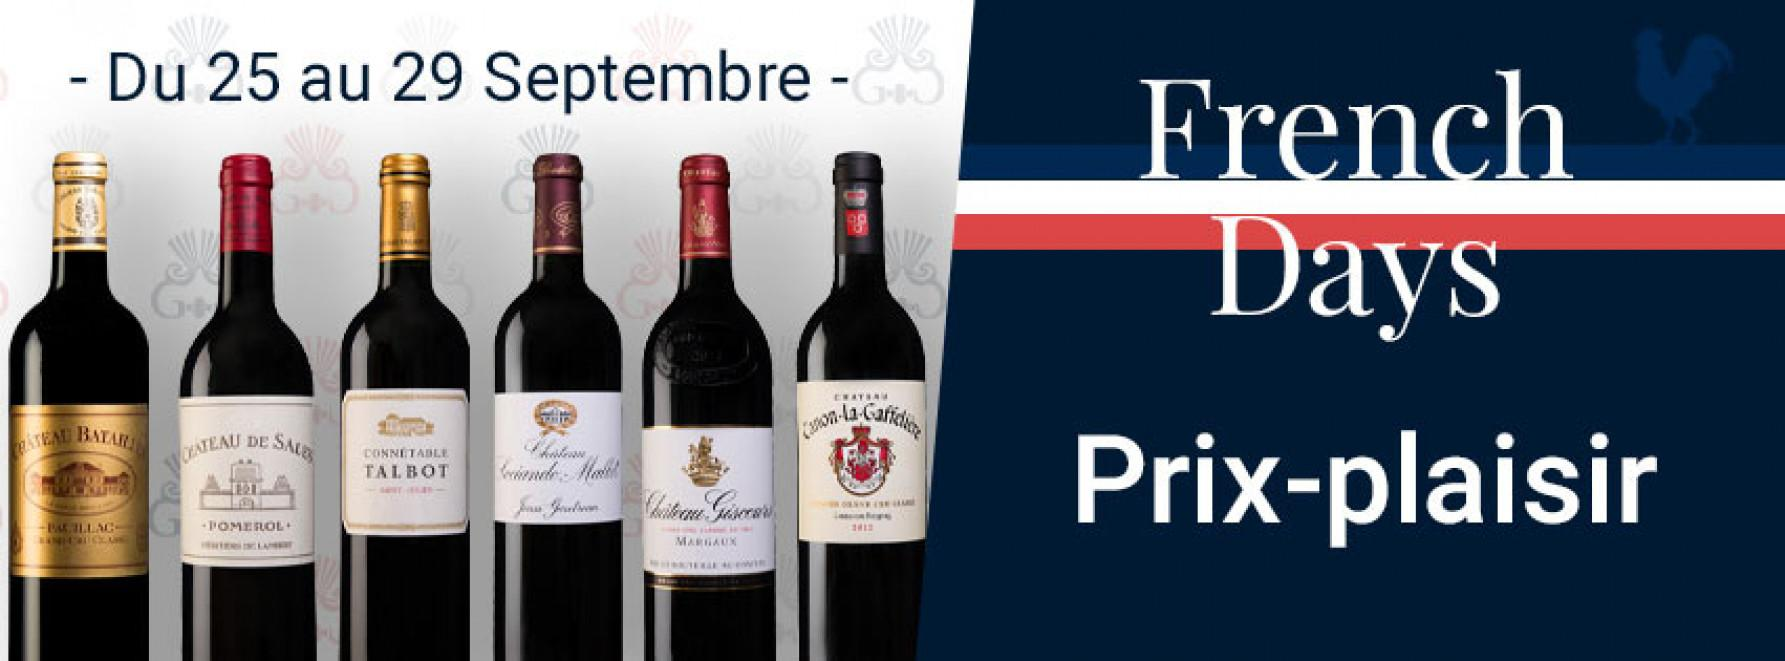 French Days | Prix-plaisir